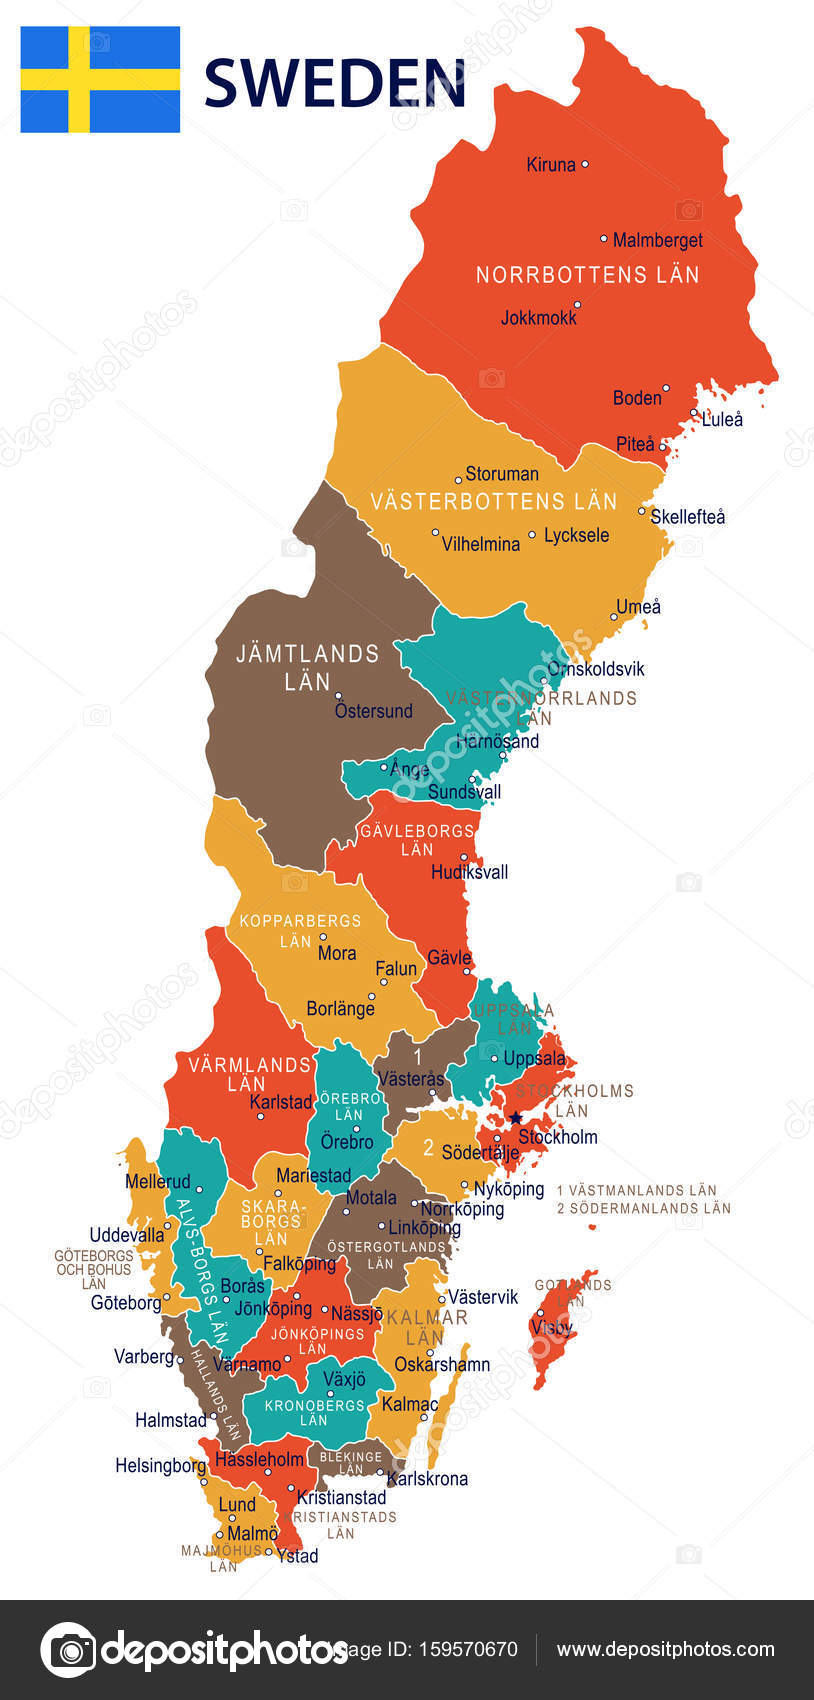 Sweden Map And Flag Illustration Stock Vector C Dikobrazik